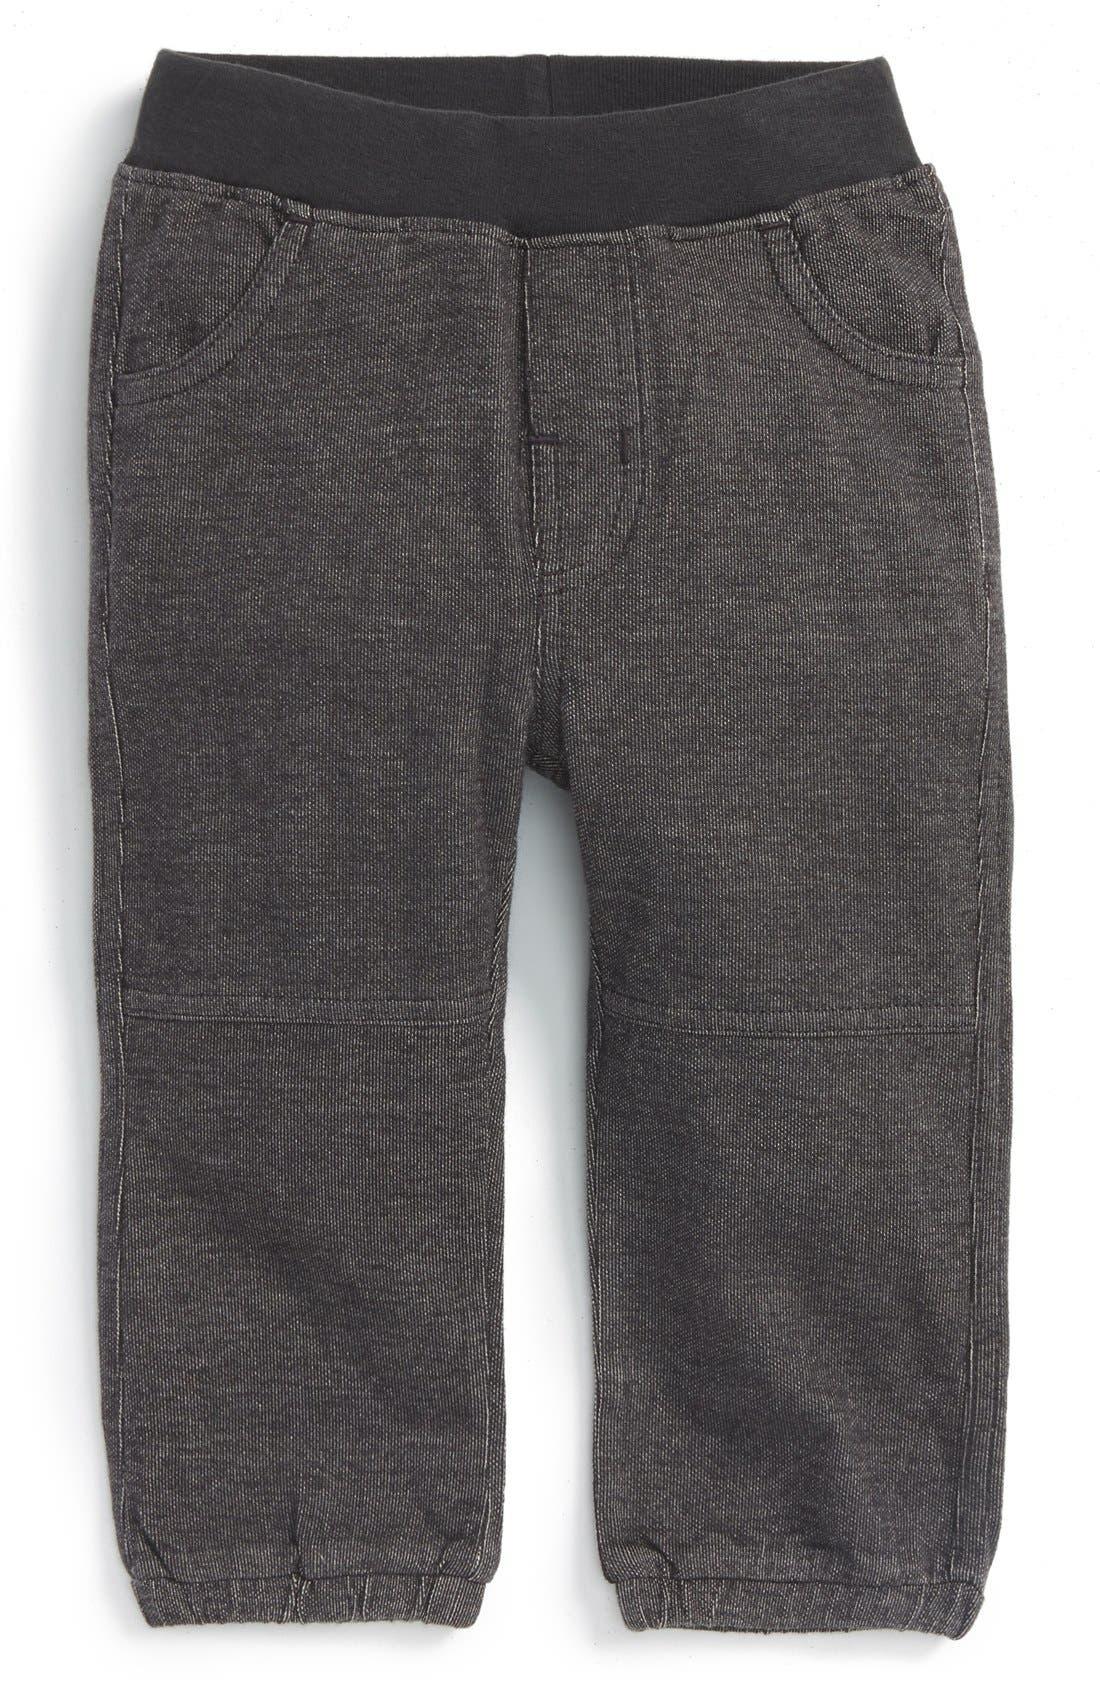 Alternate Image 1 Selected - Tea Collection Denim Look Sweatpants (Baby Boys)